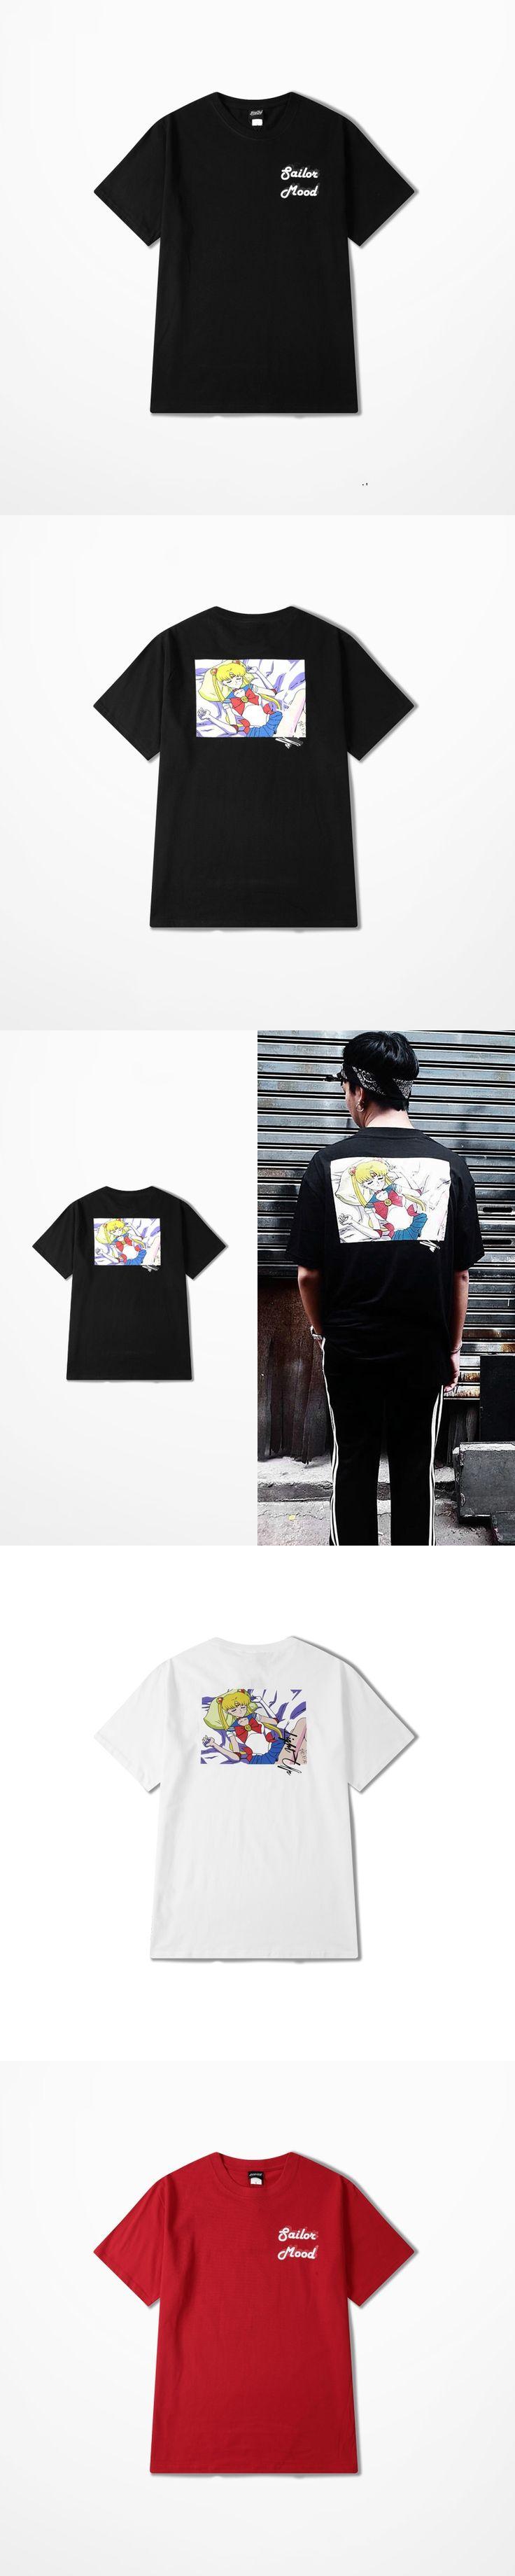 Ulzzang 2017 Summer New Fashion Popular Cartoon Sailor Moon Print  T-shirts Man And Women Lovers Couple Cotton Medusa T Shirt